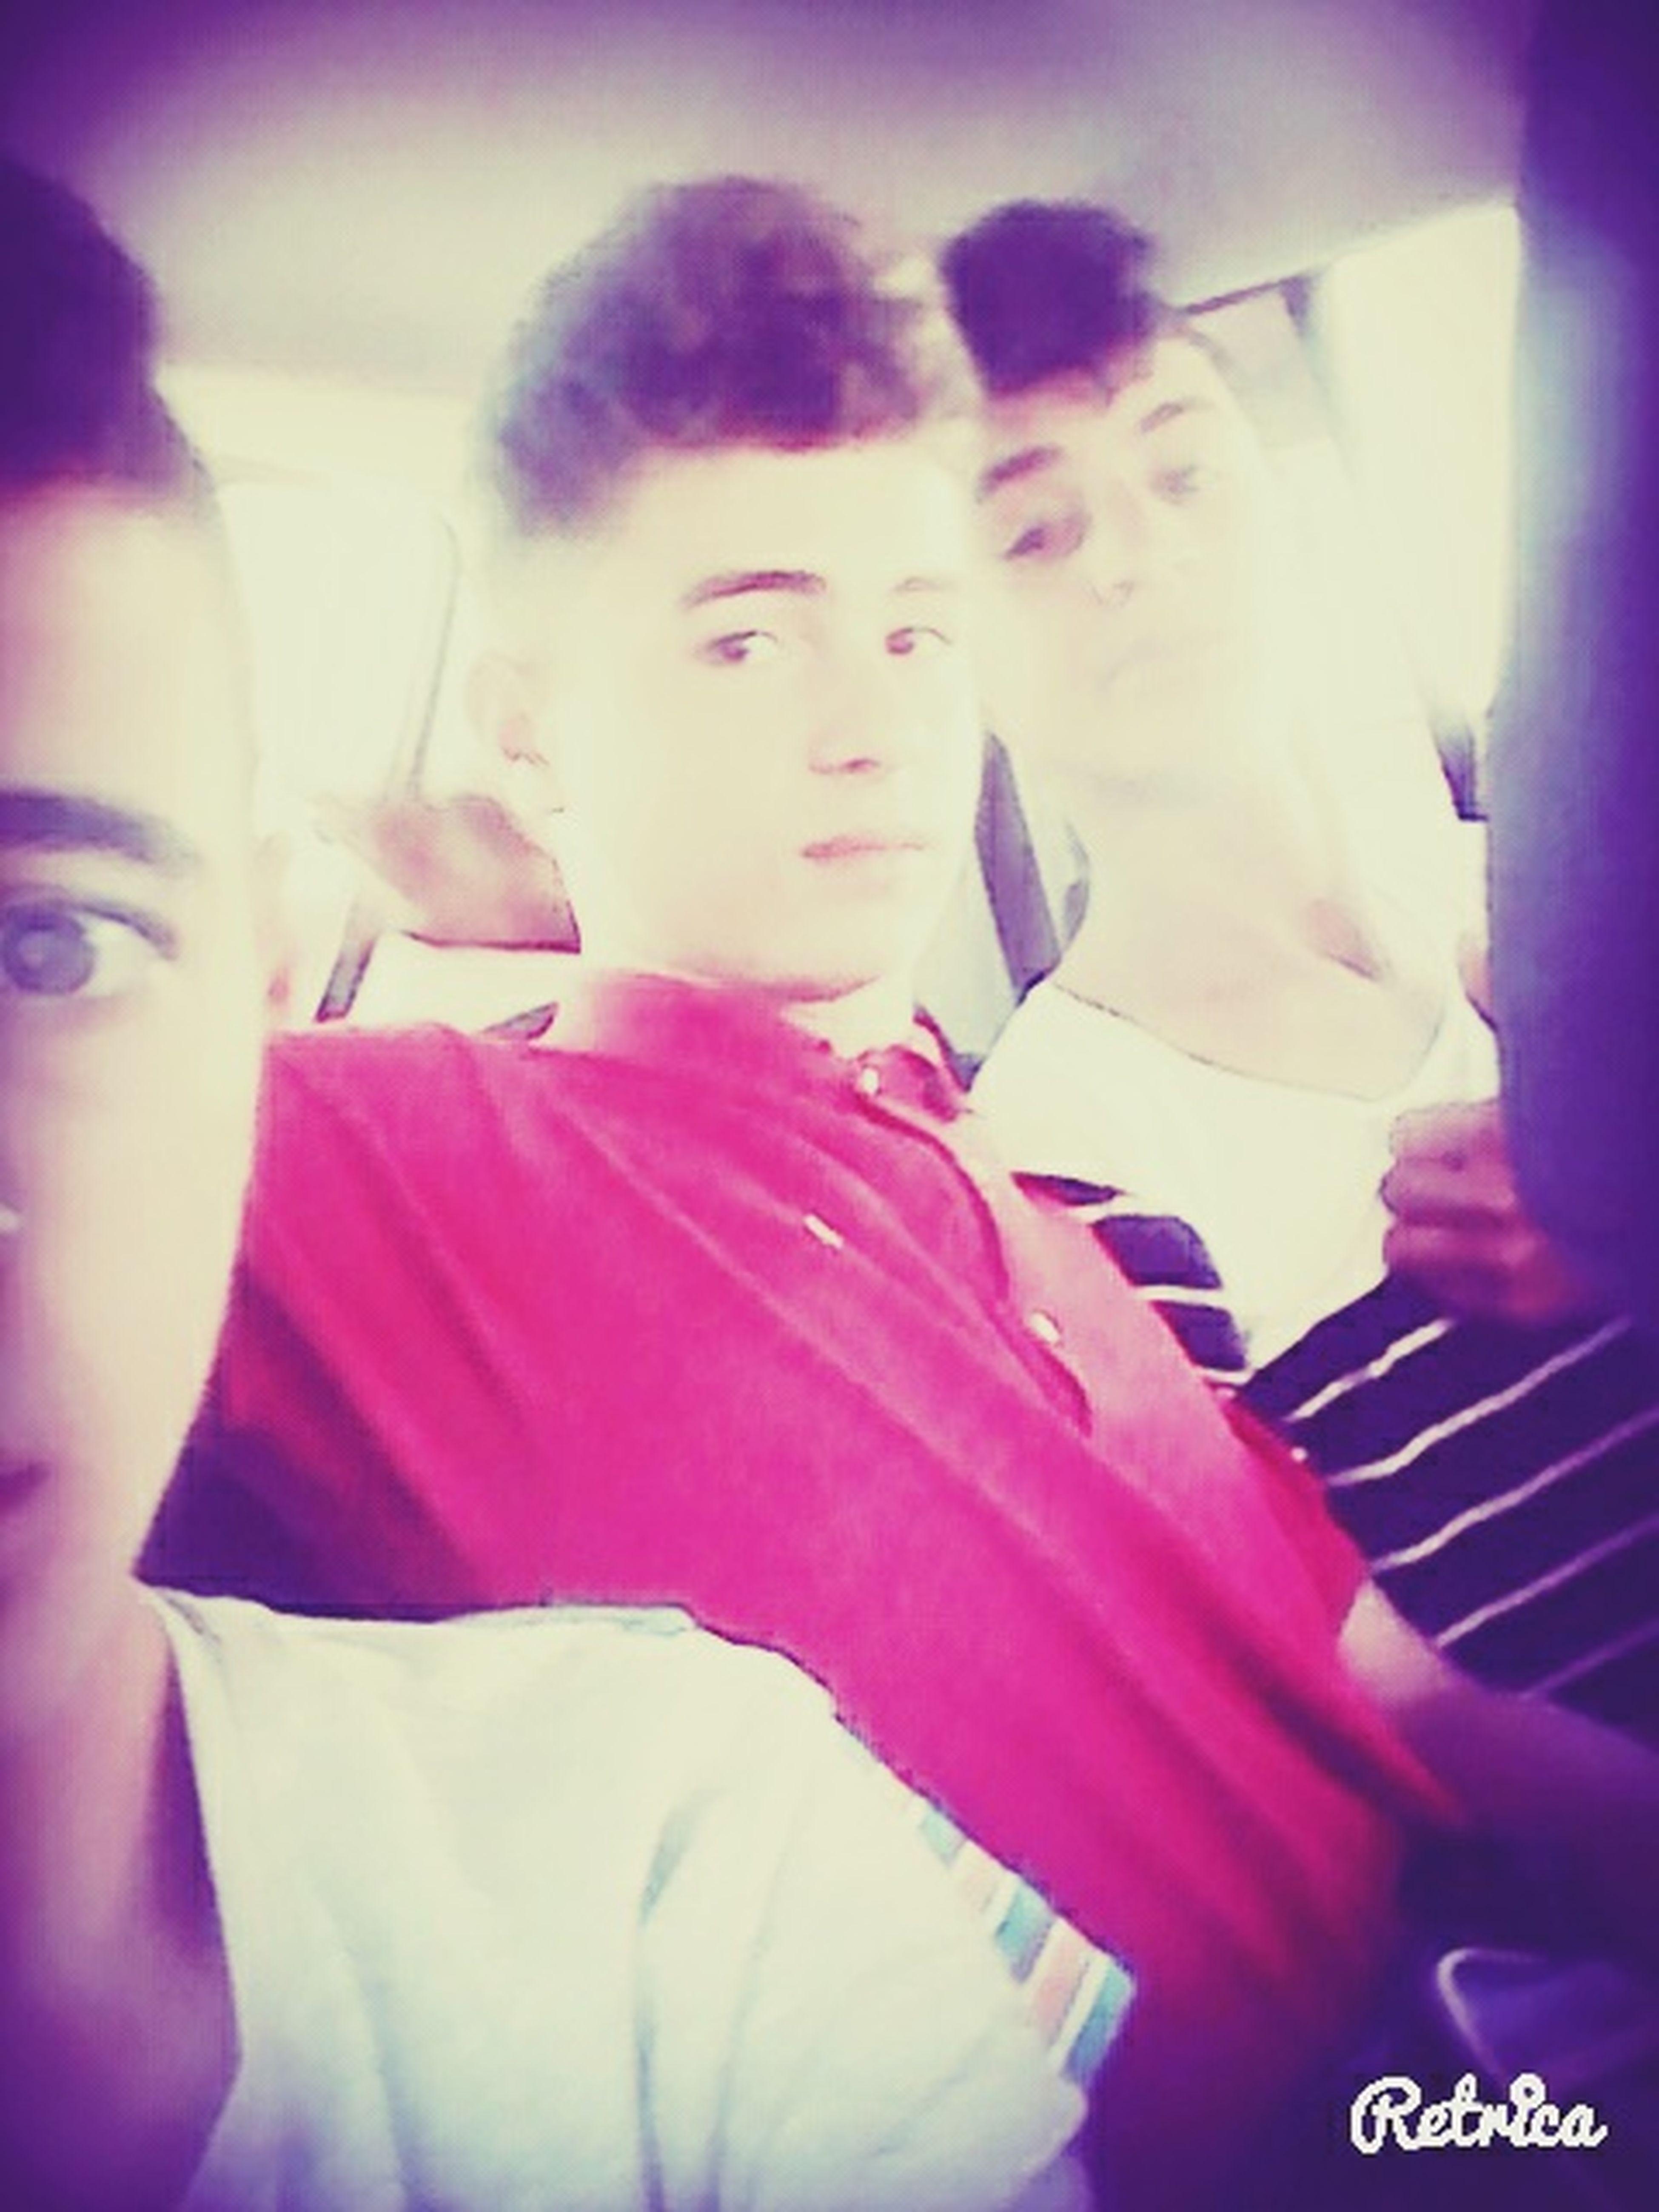 That's Me And My Friends BouBa Et Idir <3